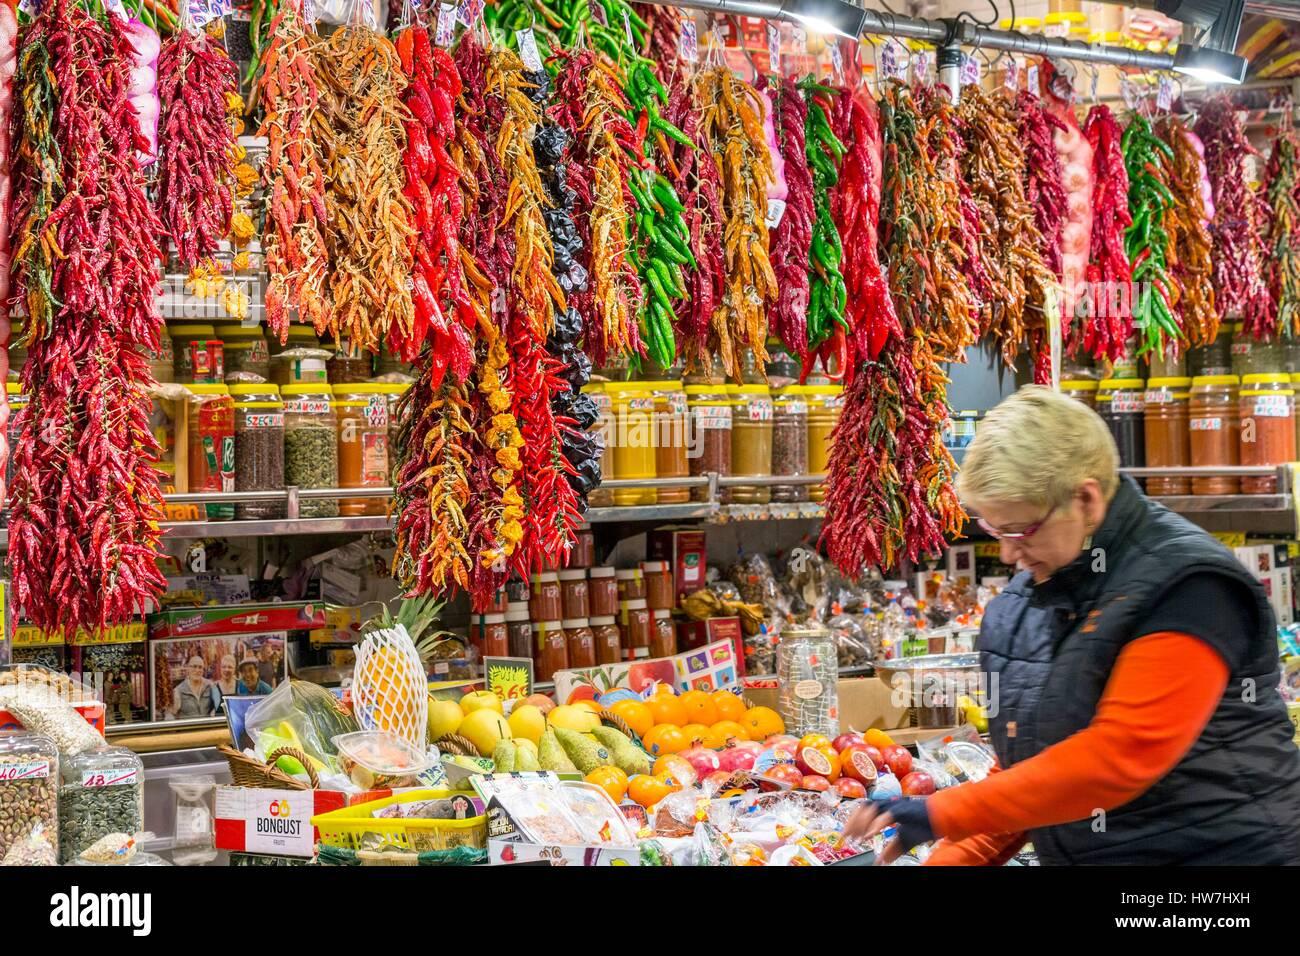 Spain, Catalonia, Barcelona, Ciutat Vella, the Boqueria market built in the mid-19th century, a seller of fruit - Stock Image